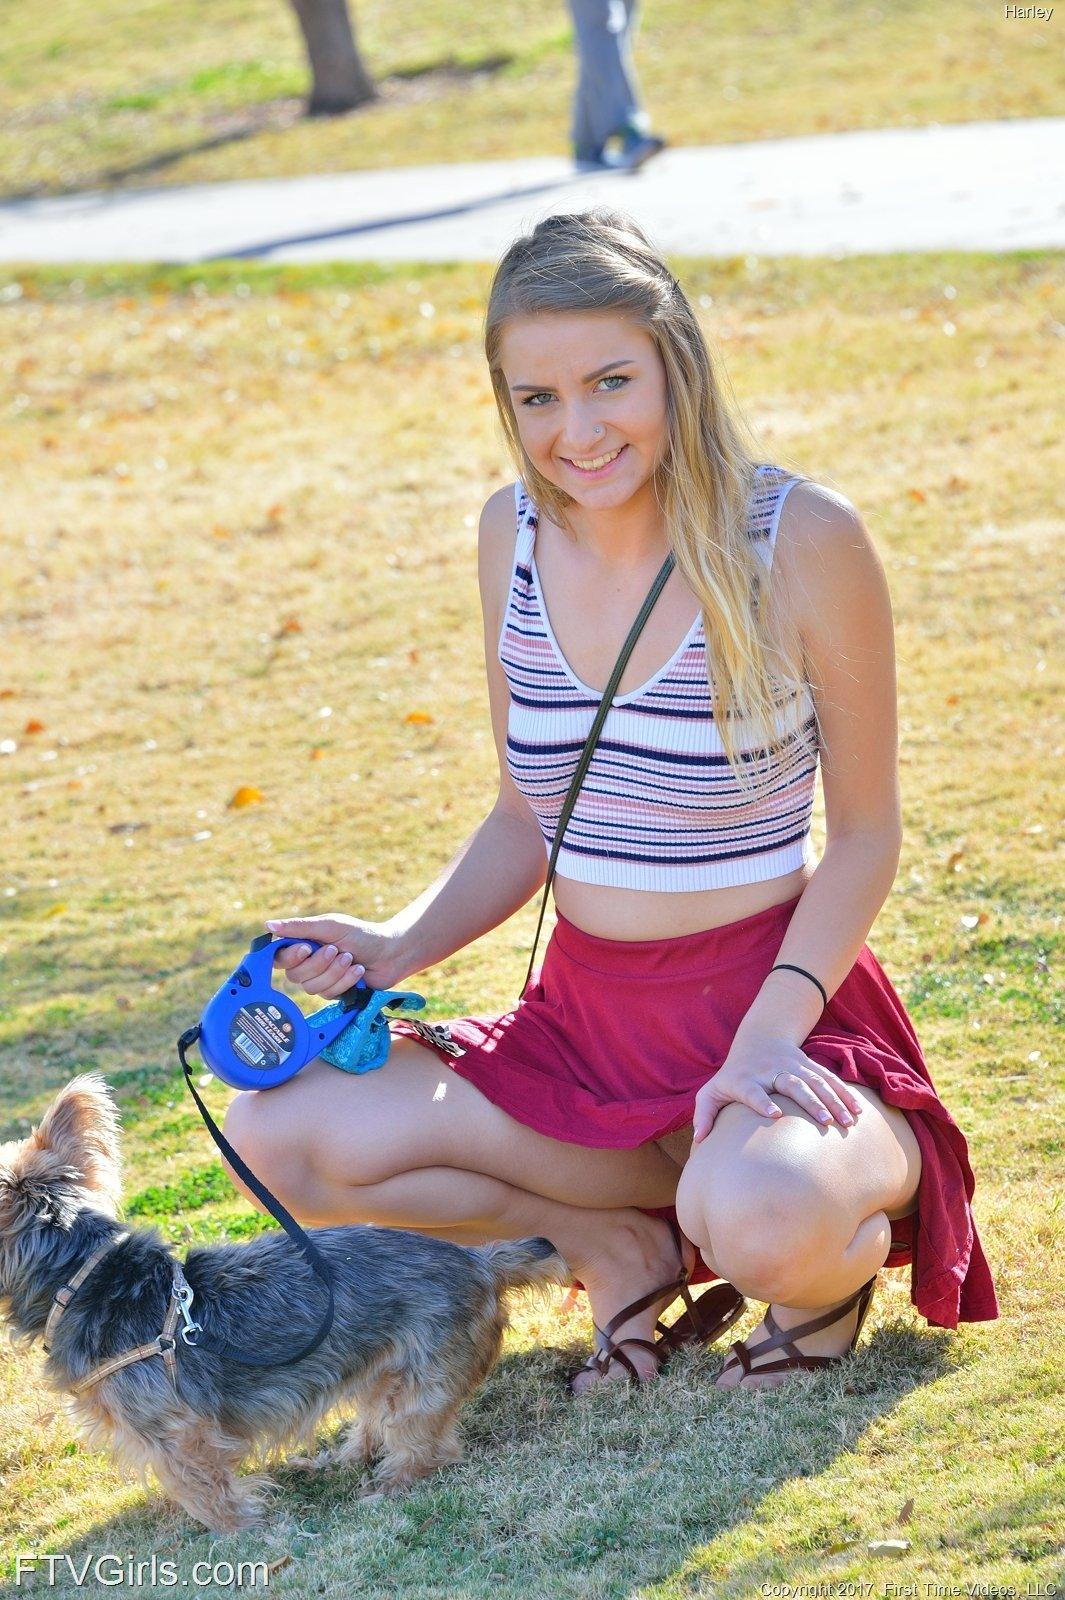 Skirt-wearing blondie with blue eyes teasing her pussy